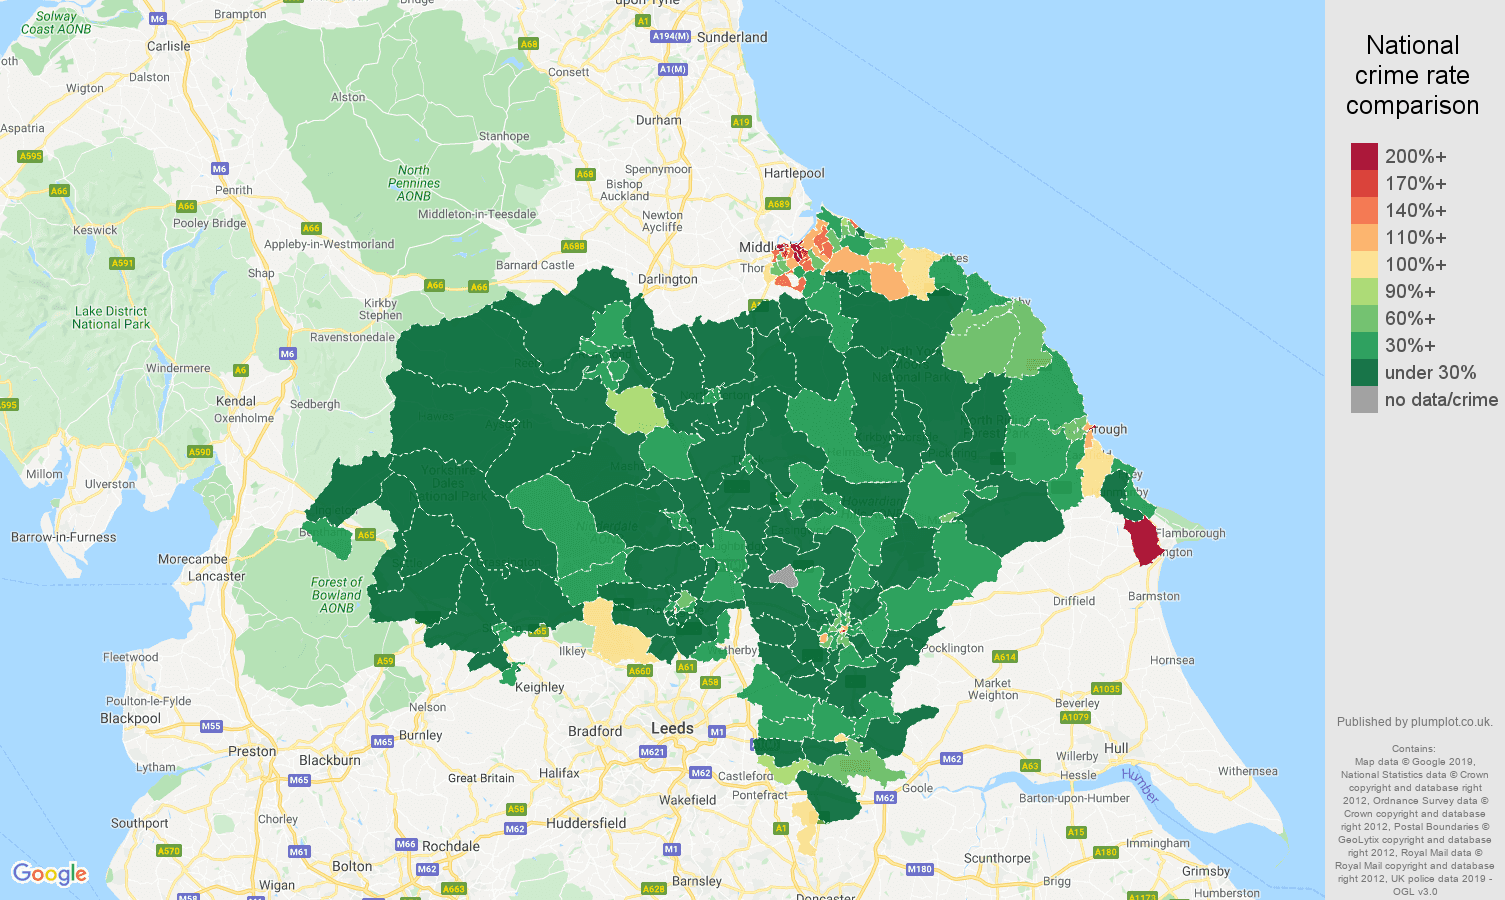 North Yorkshire public order crime rate comparison map